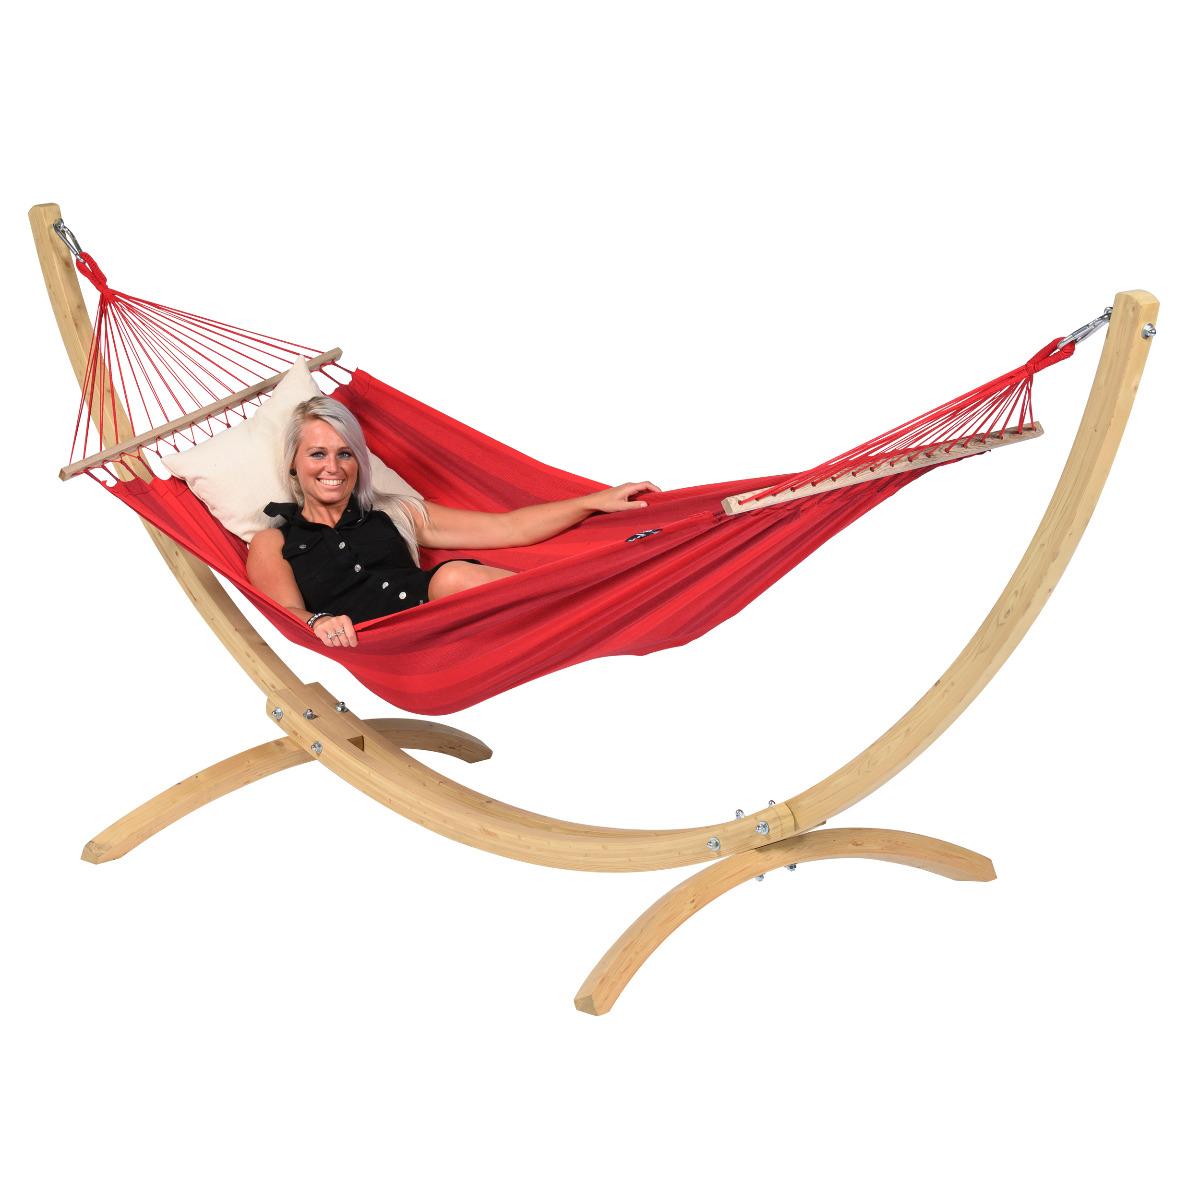 Hangmatset Single 'Wood & Relax' Red - Tropilex �